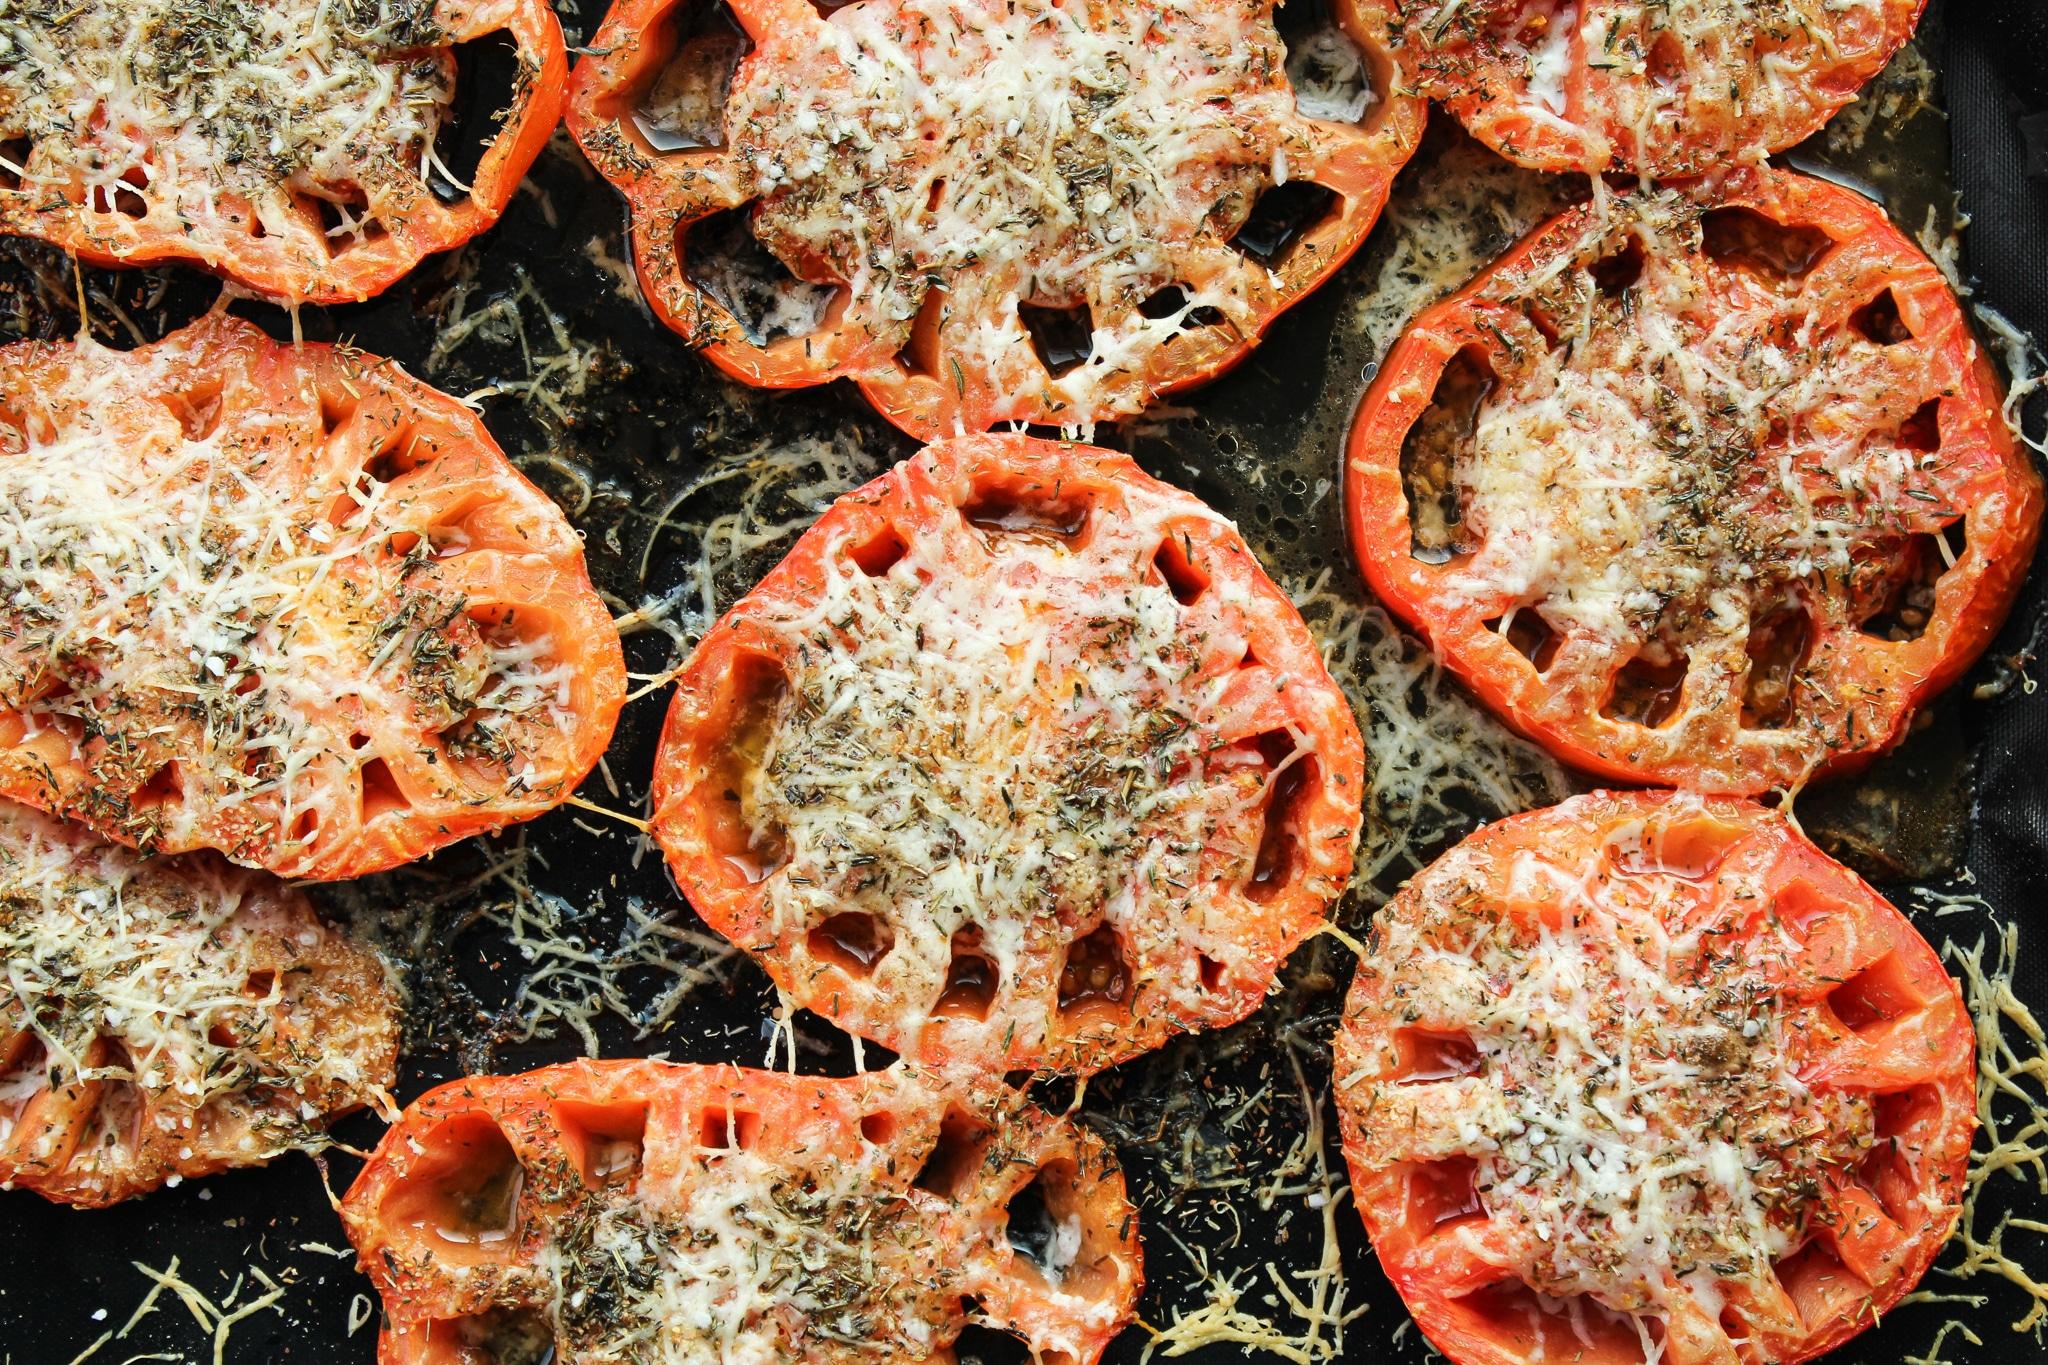 Tomaten mit Parmesankruste aus dem Backofen